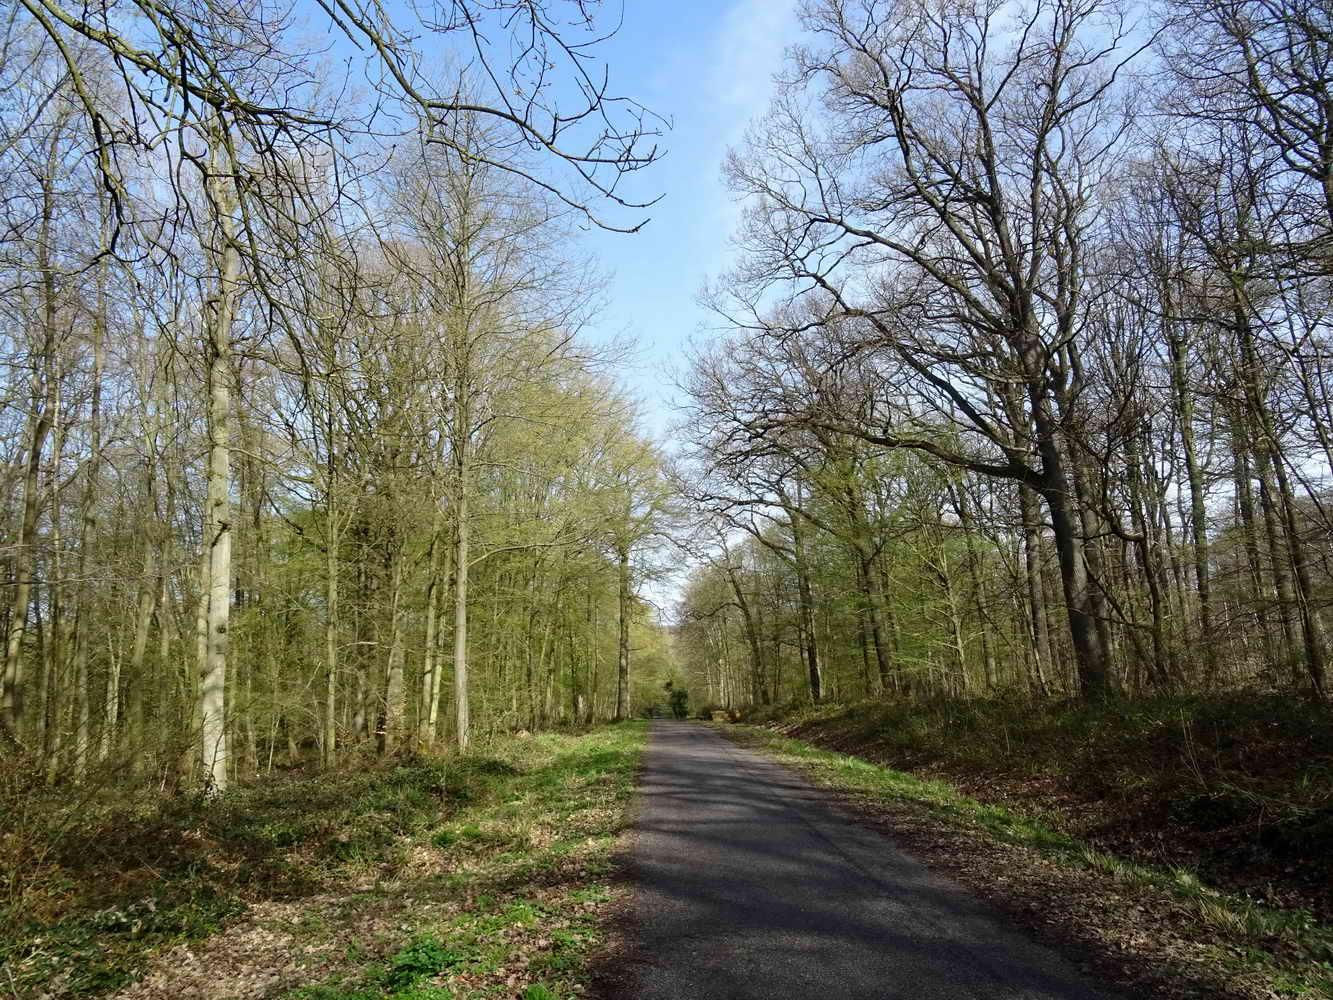 rando en forêt de Carnelle avril 2018